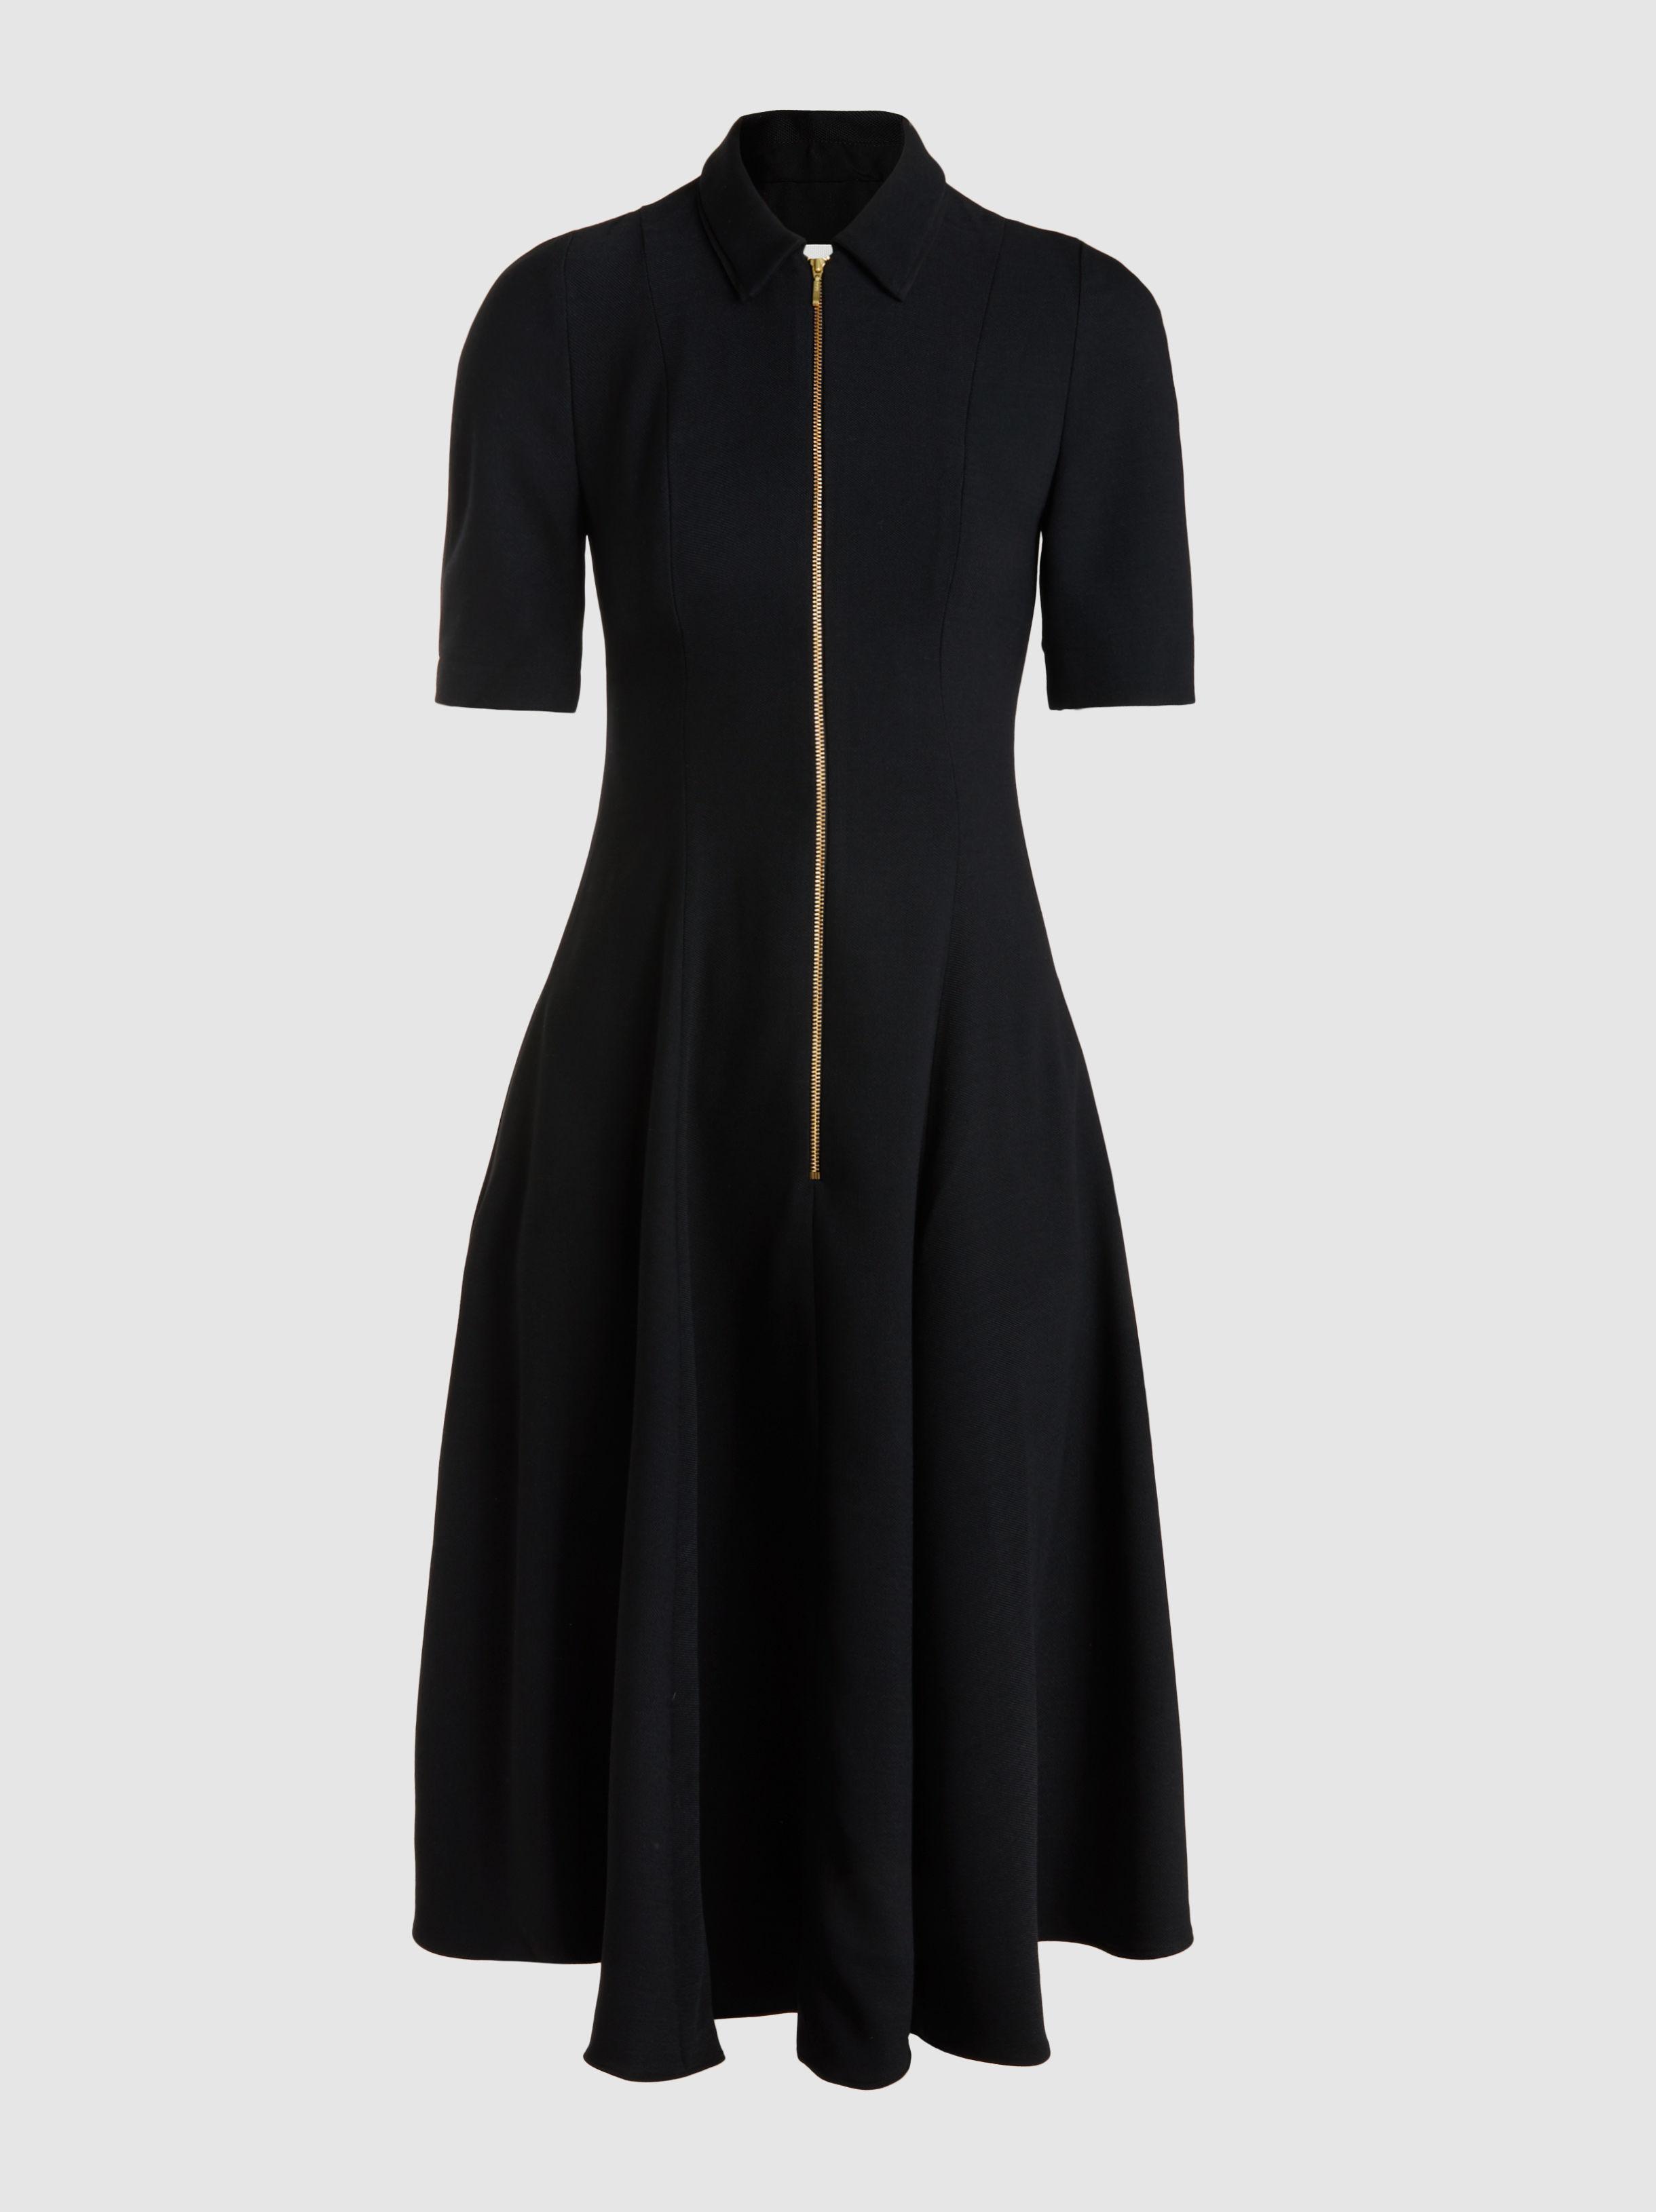 Sleeveless Midi Shirt Dress Cefinn Amazon Footaction Hn2k3xJW